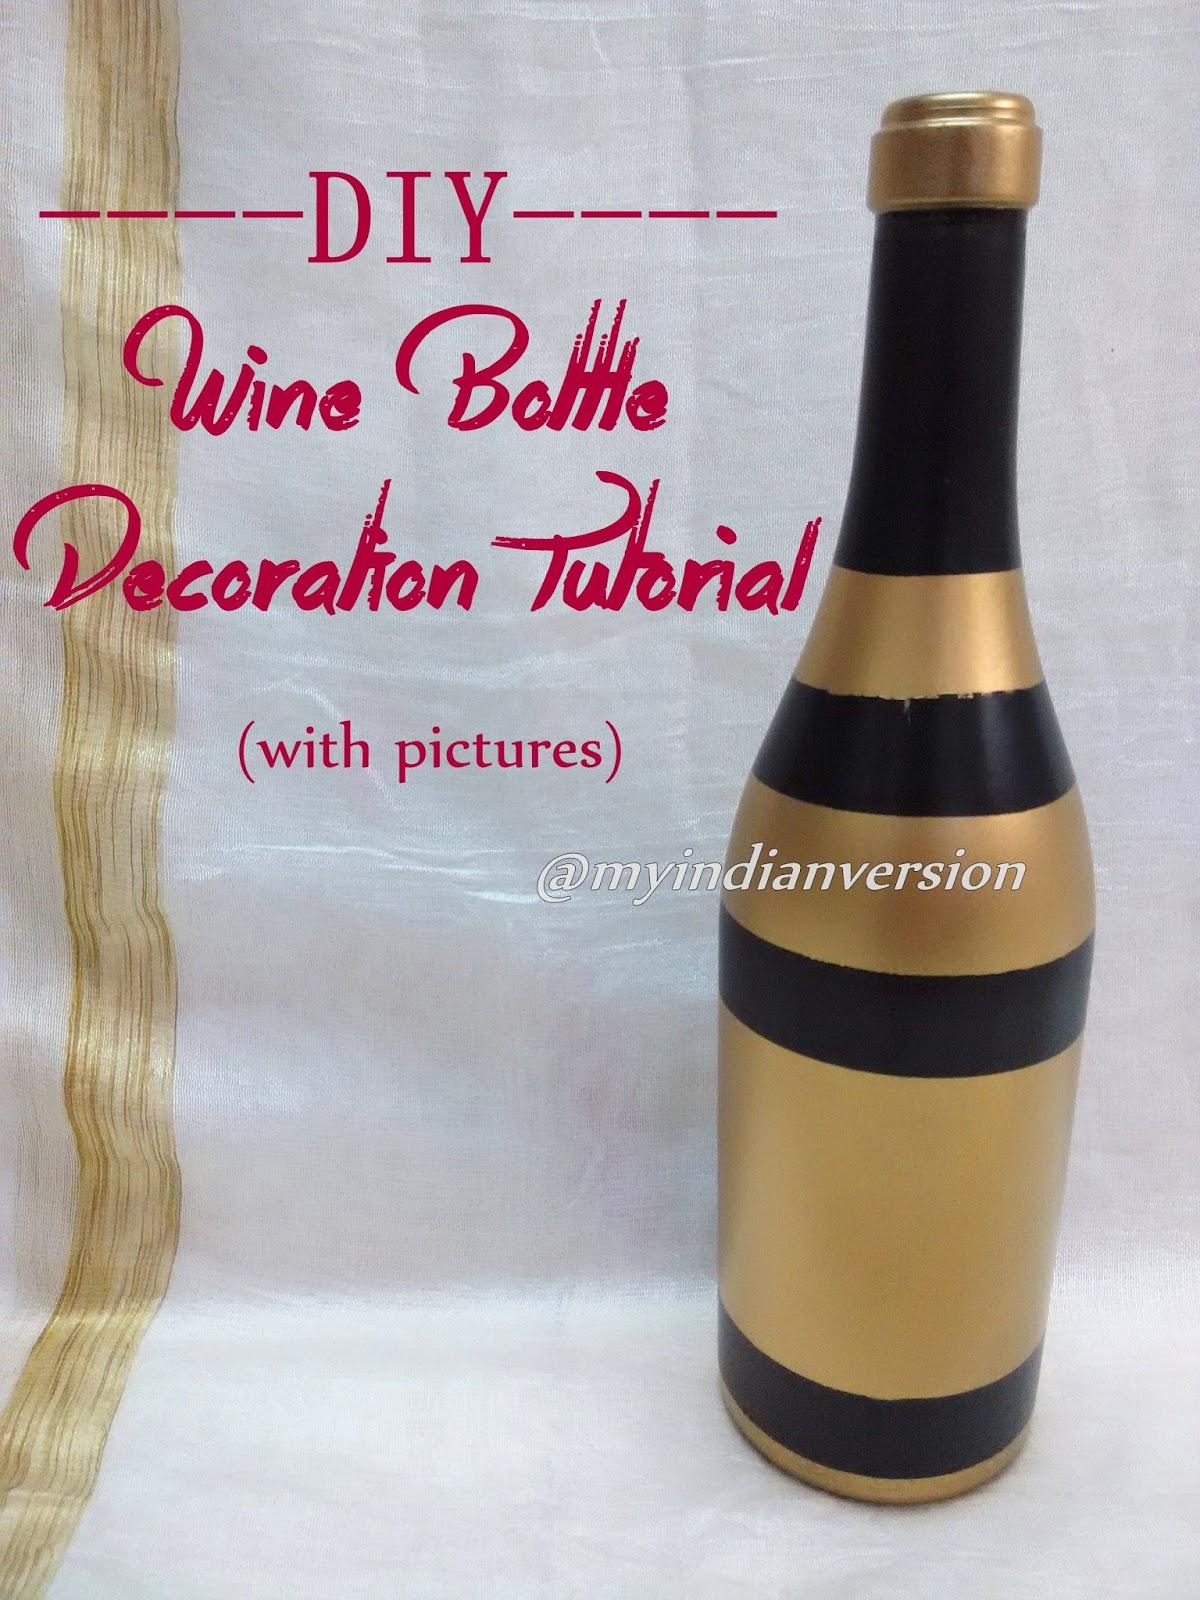 my indian version diy wine bottle decorations photo tutorial. Black Bedroom Furniture Sets. Home Design Ideas